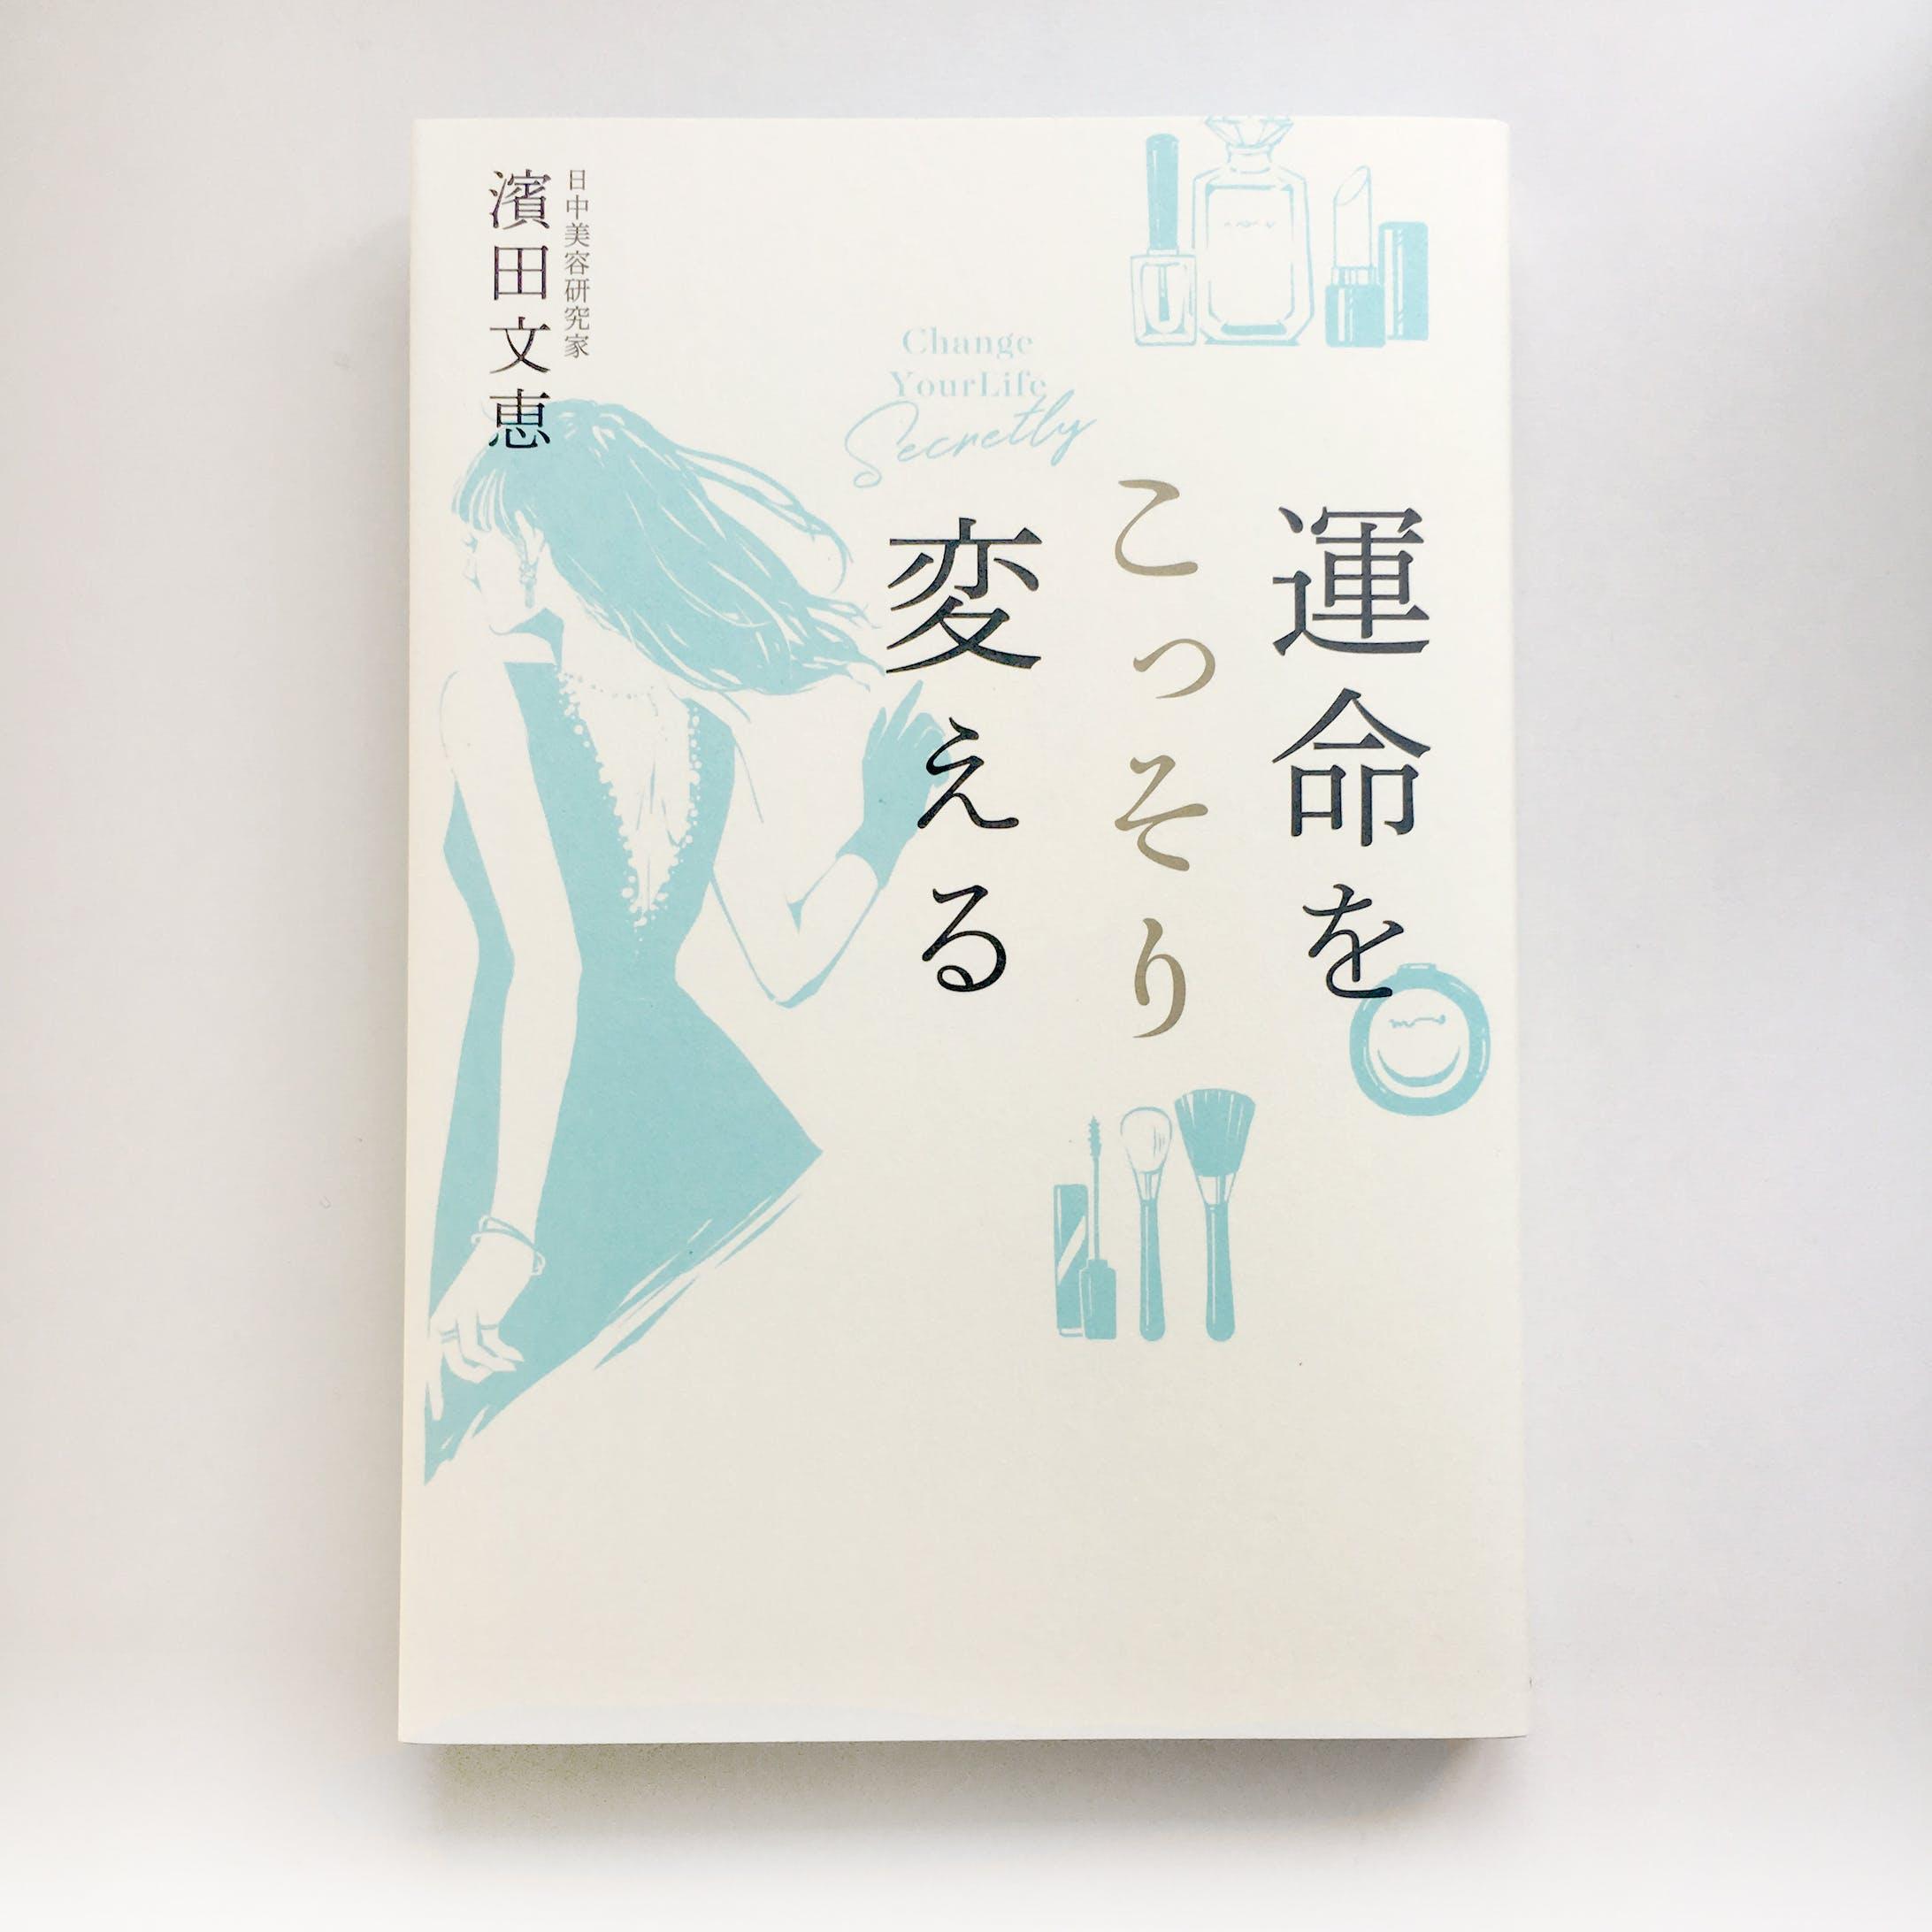 【WORK】装画 「運命をこっそり変える」/ セブン&アイ出版-2